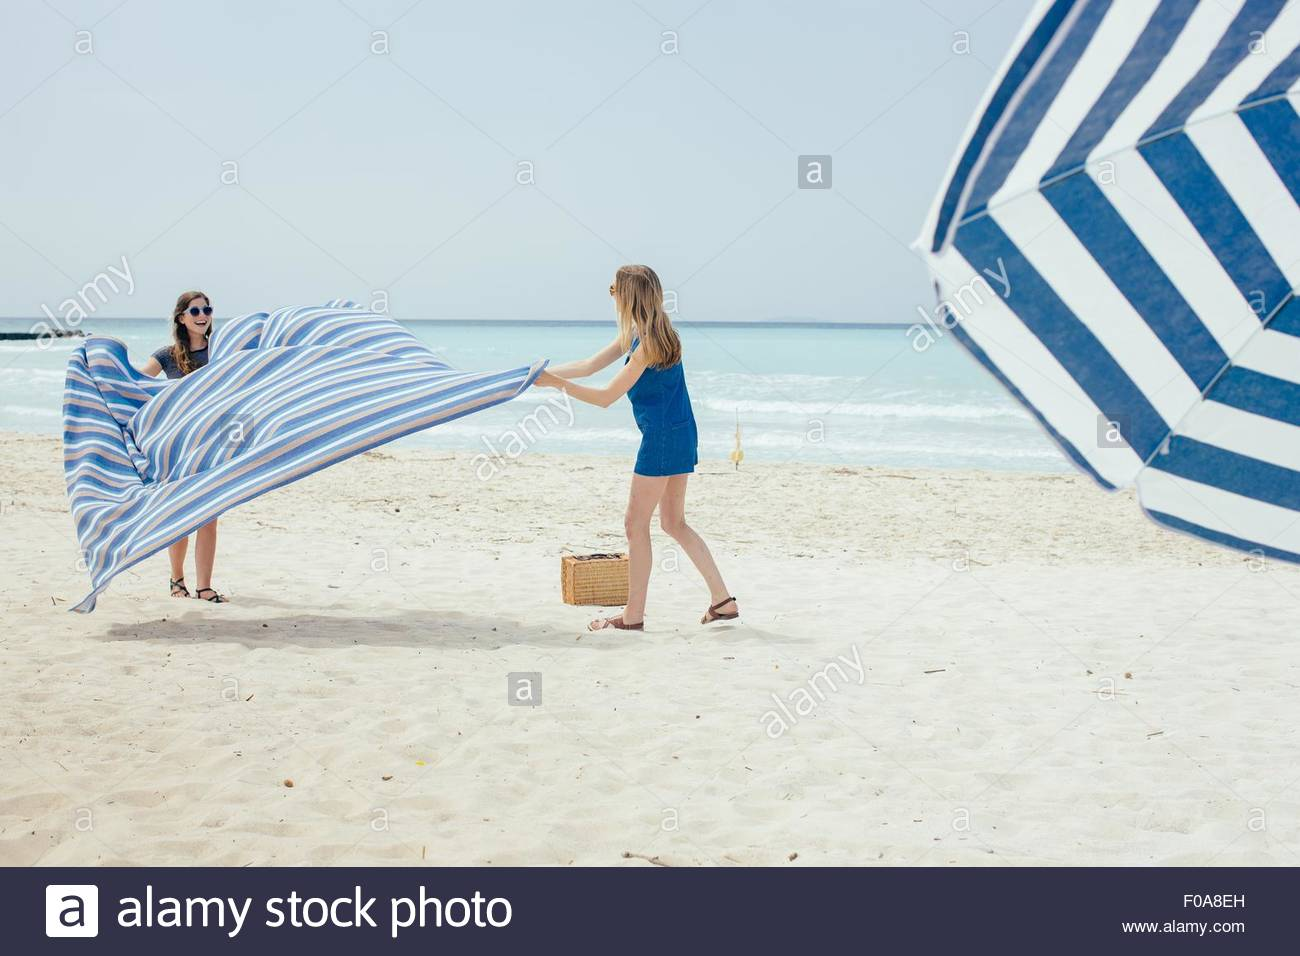 Zwei junge Freundinnen auslegen Picknickdecke am Strand Stockfoto